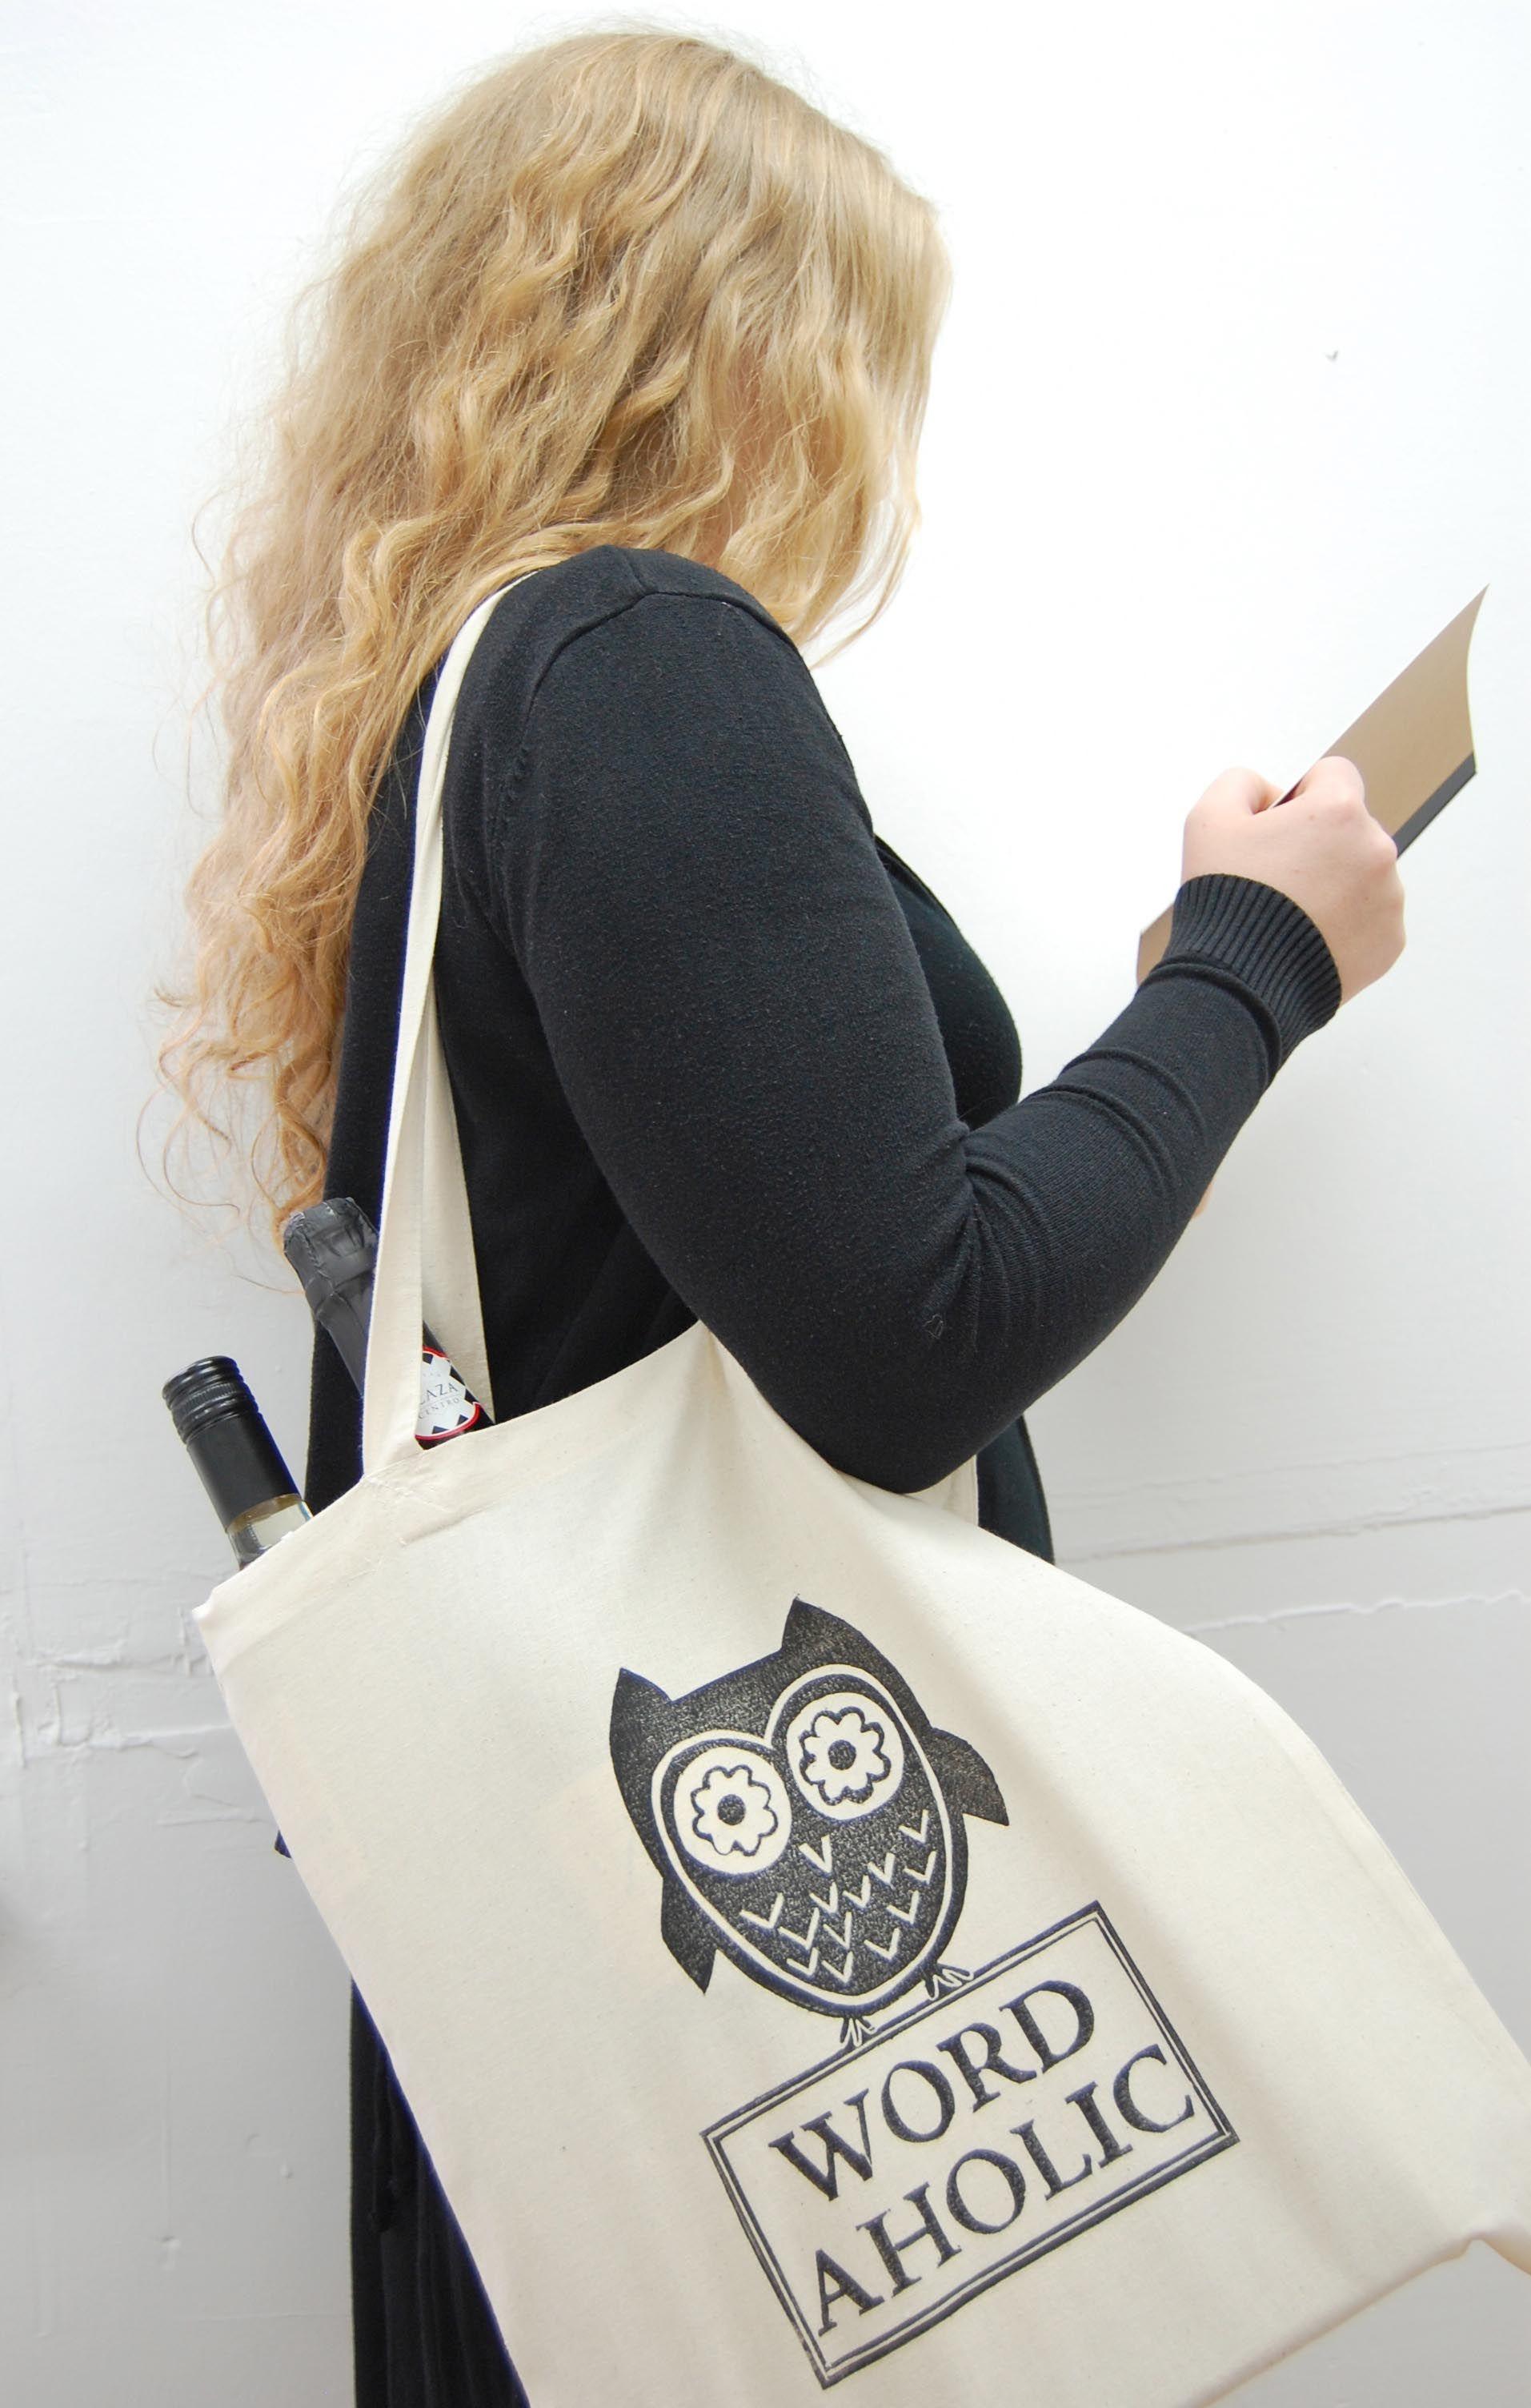 Wordtree | Wordaholic cotton shopping bag | Printed by Wordtree | The Wordtree Emporium